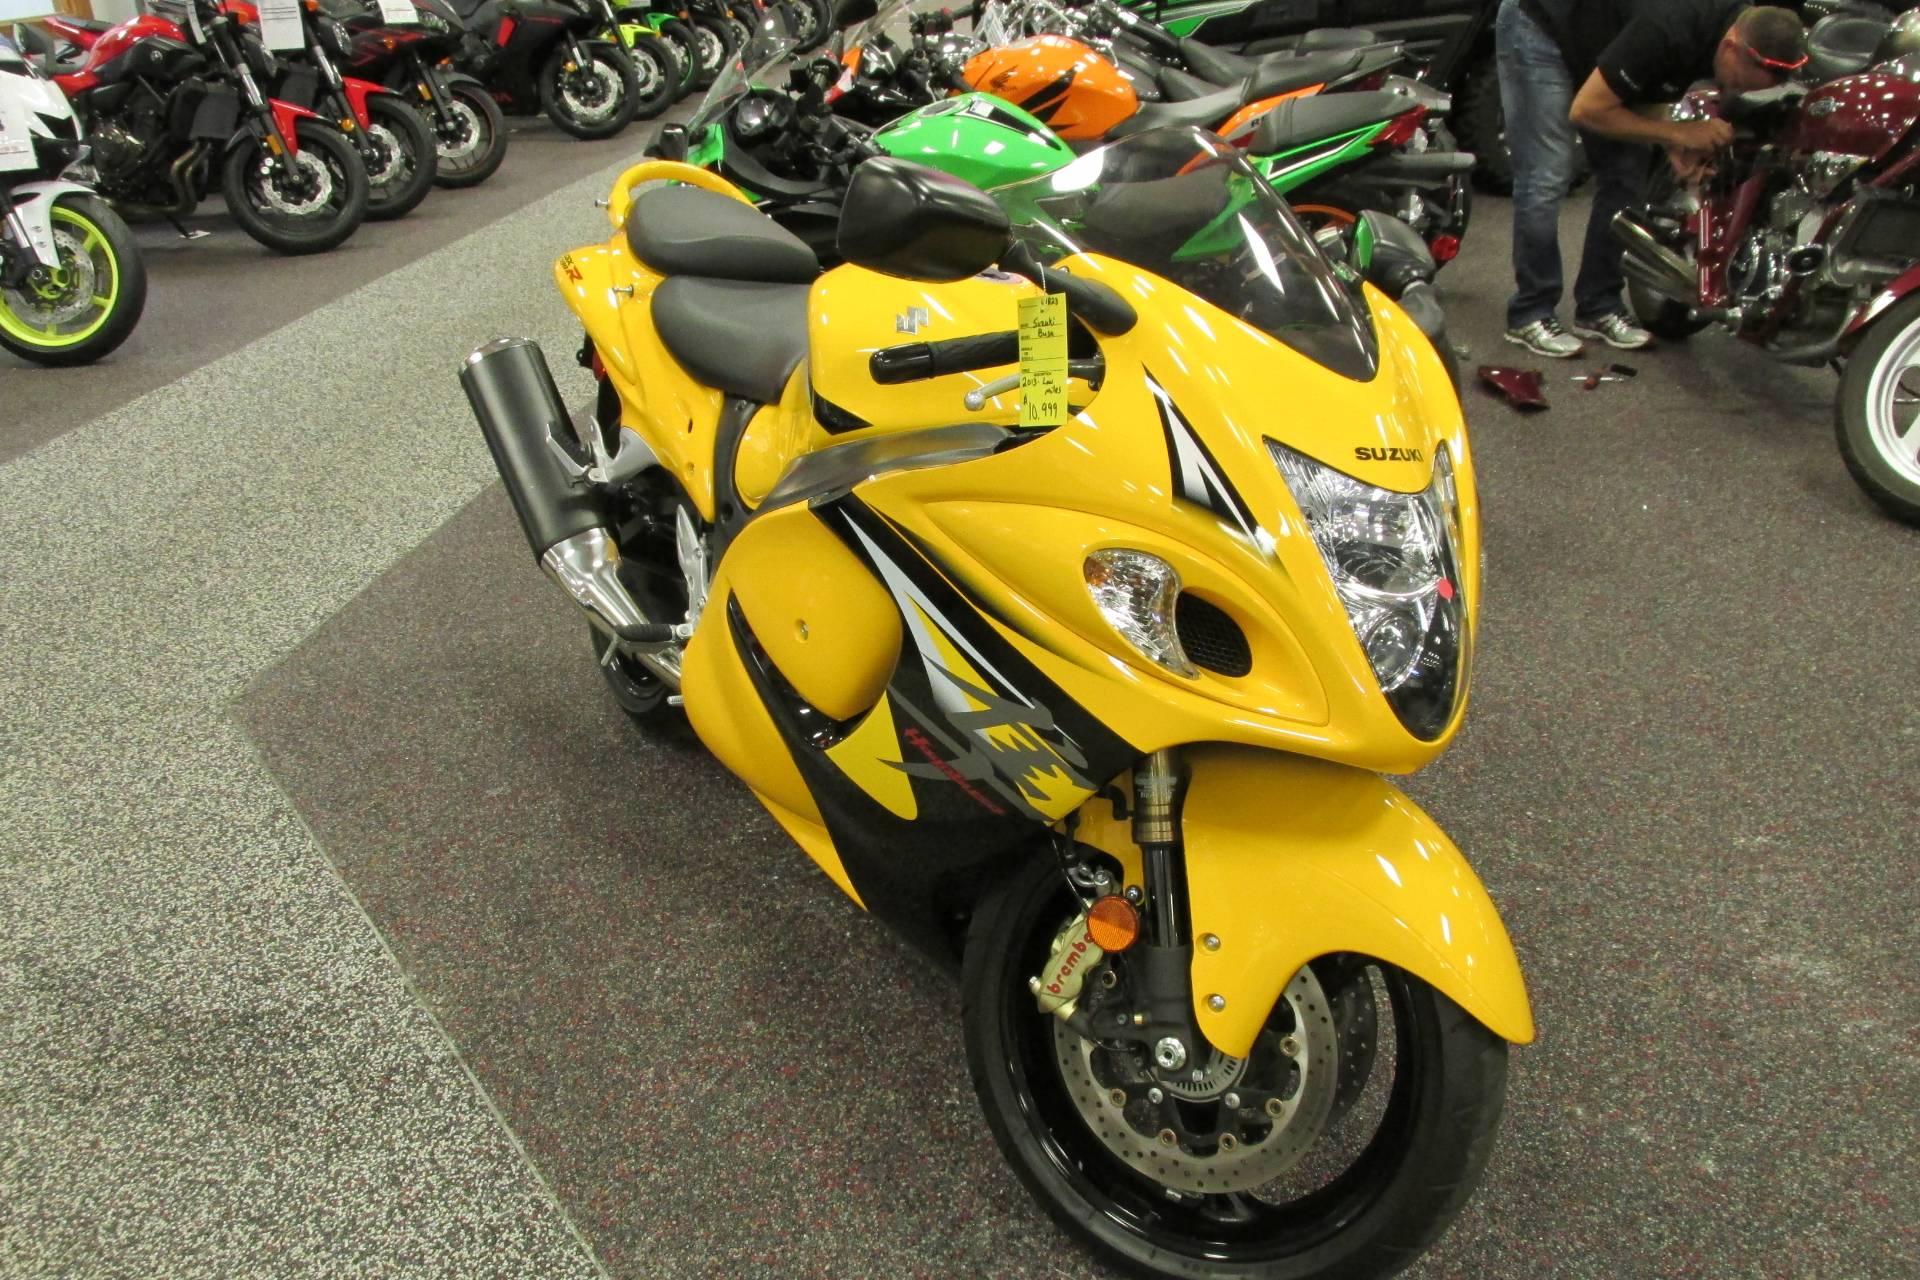 2013 Suzuki HAYABUSA 2